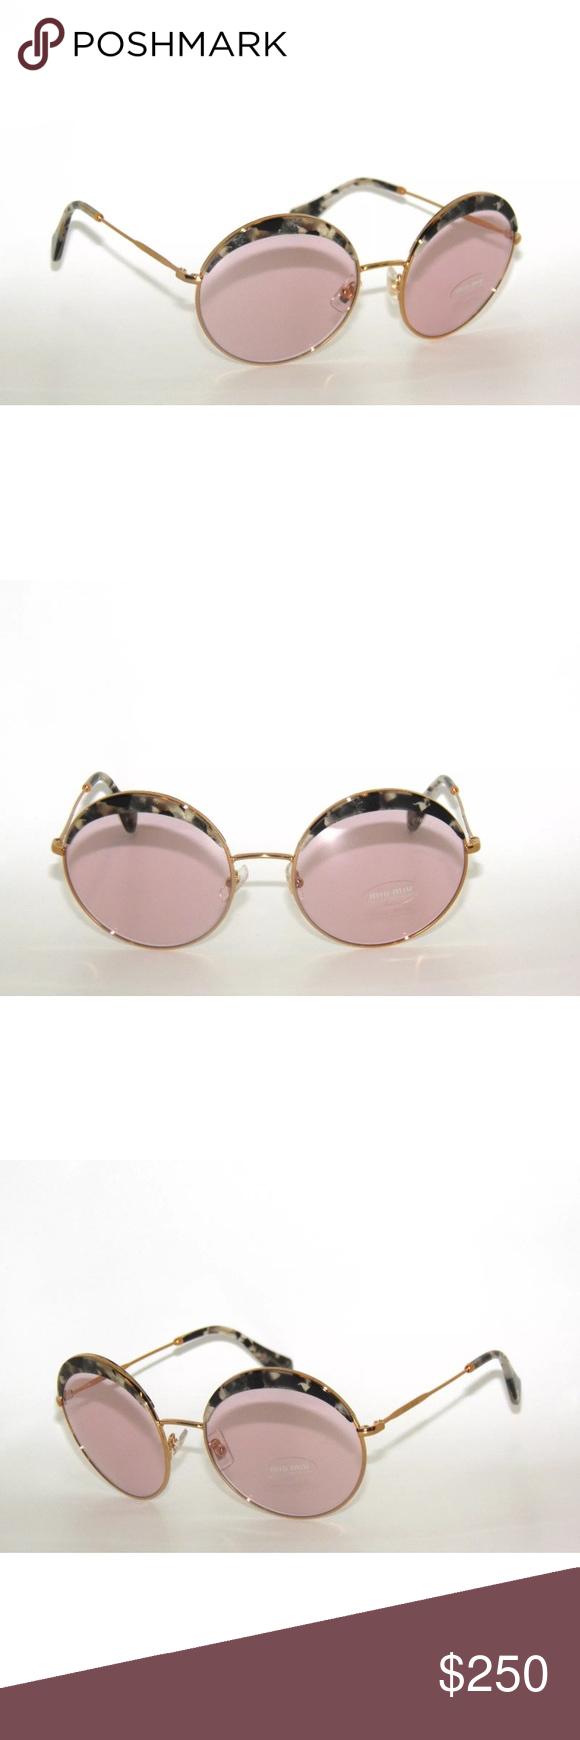 1b0aafe8f62a Miu Miu Sunglasses 51Q gold pink frame New Comes with Miu Miu case Authentic  Miu Miu Accessories Sunglasses